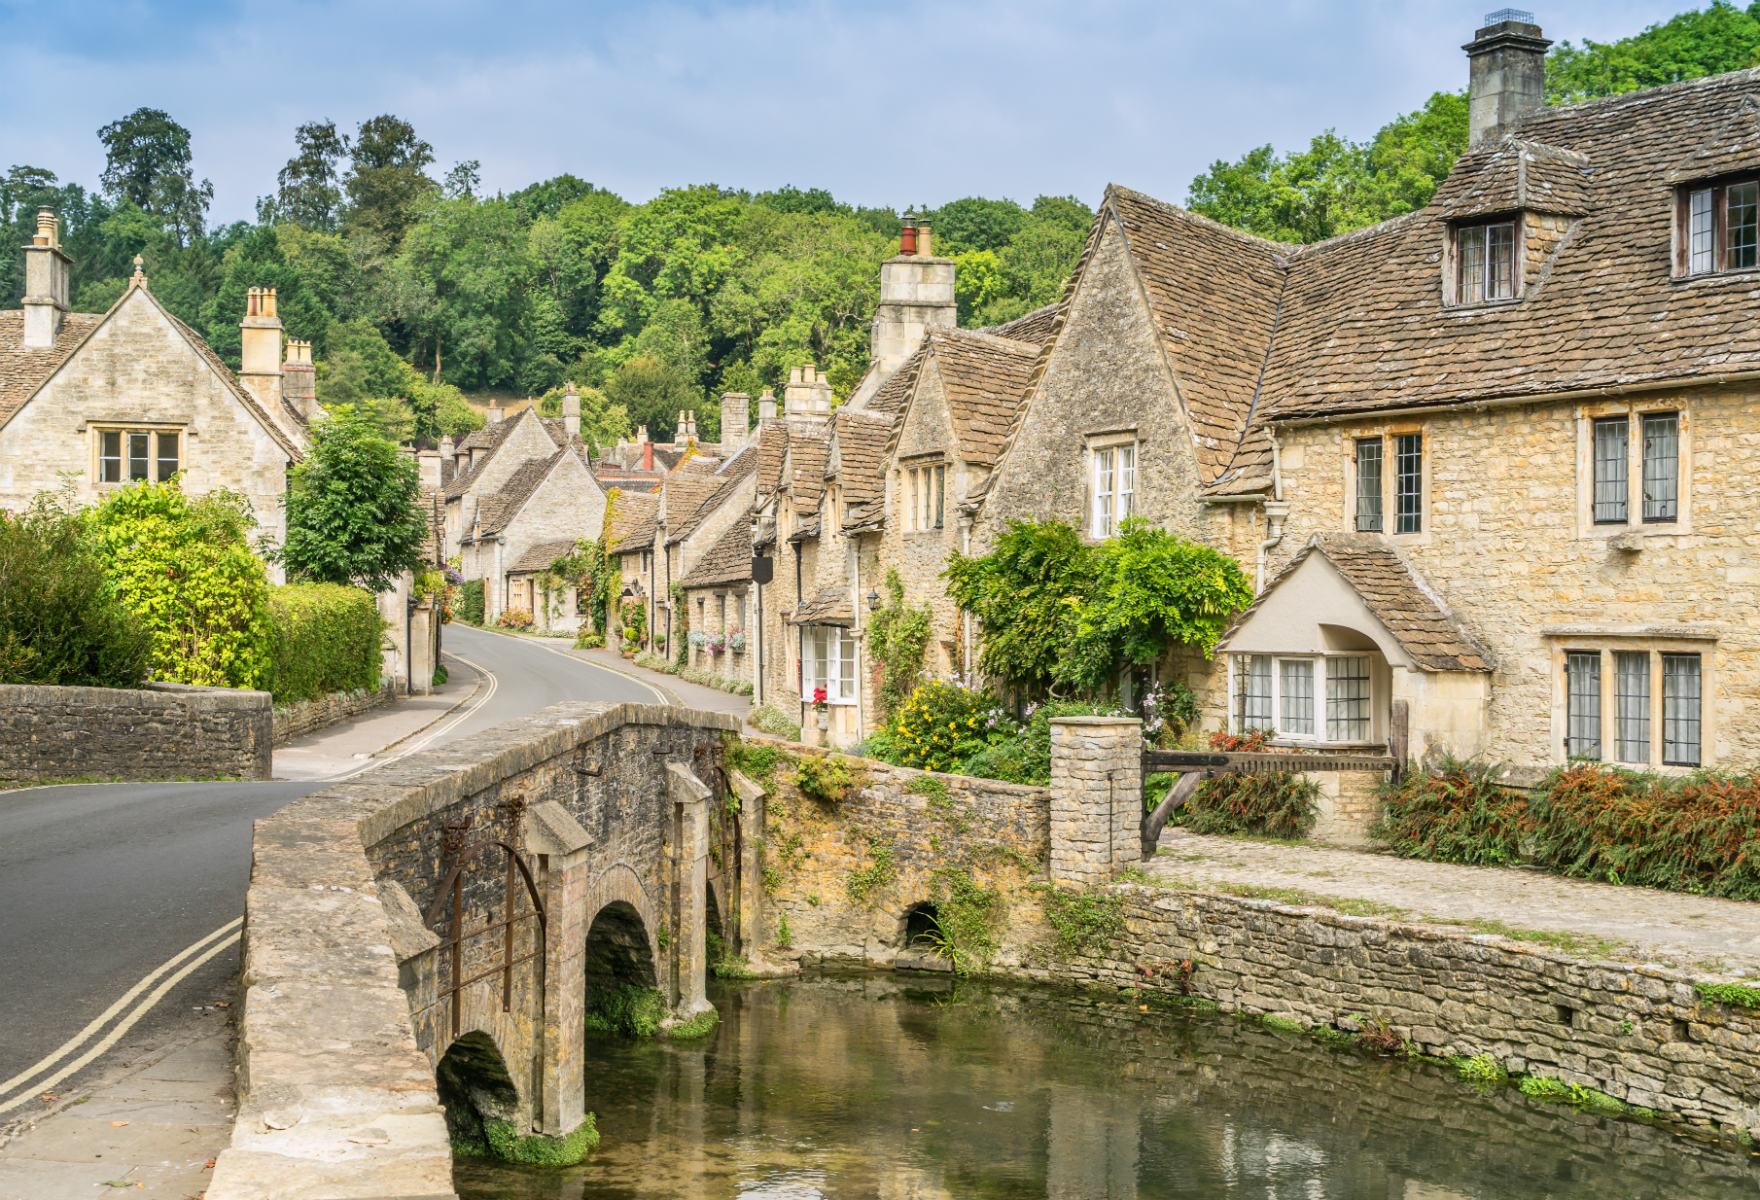 Castle Combe (credit: Gordon Bell/Shutterstock)